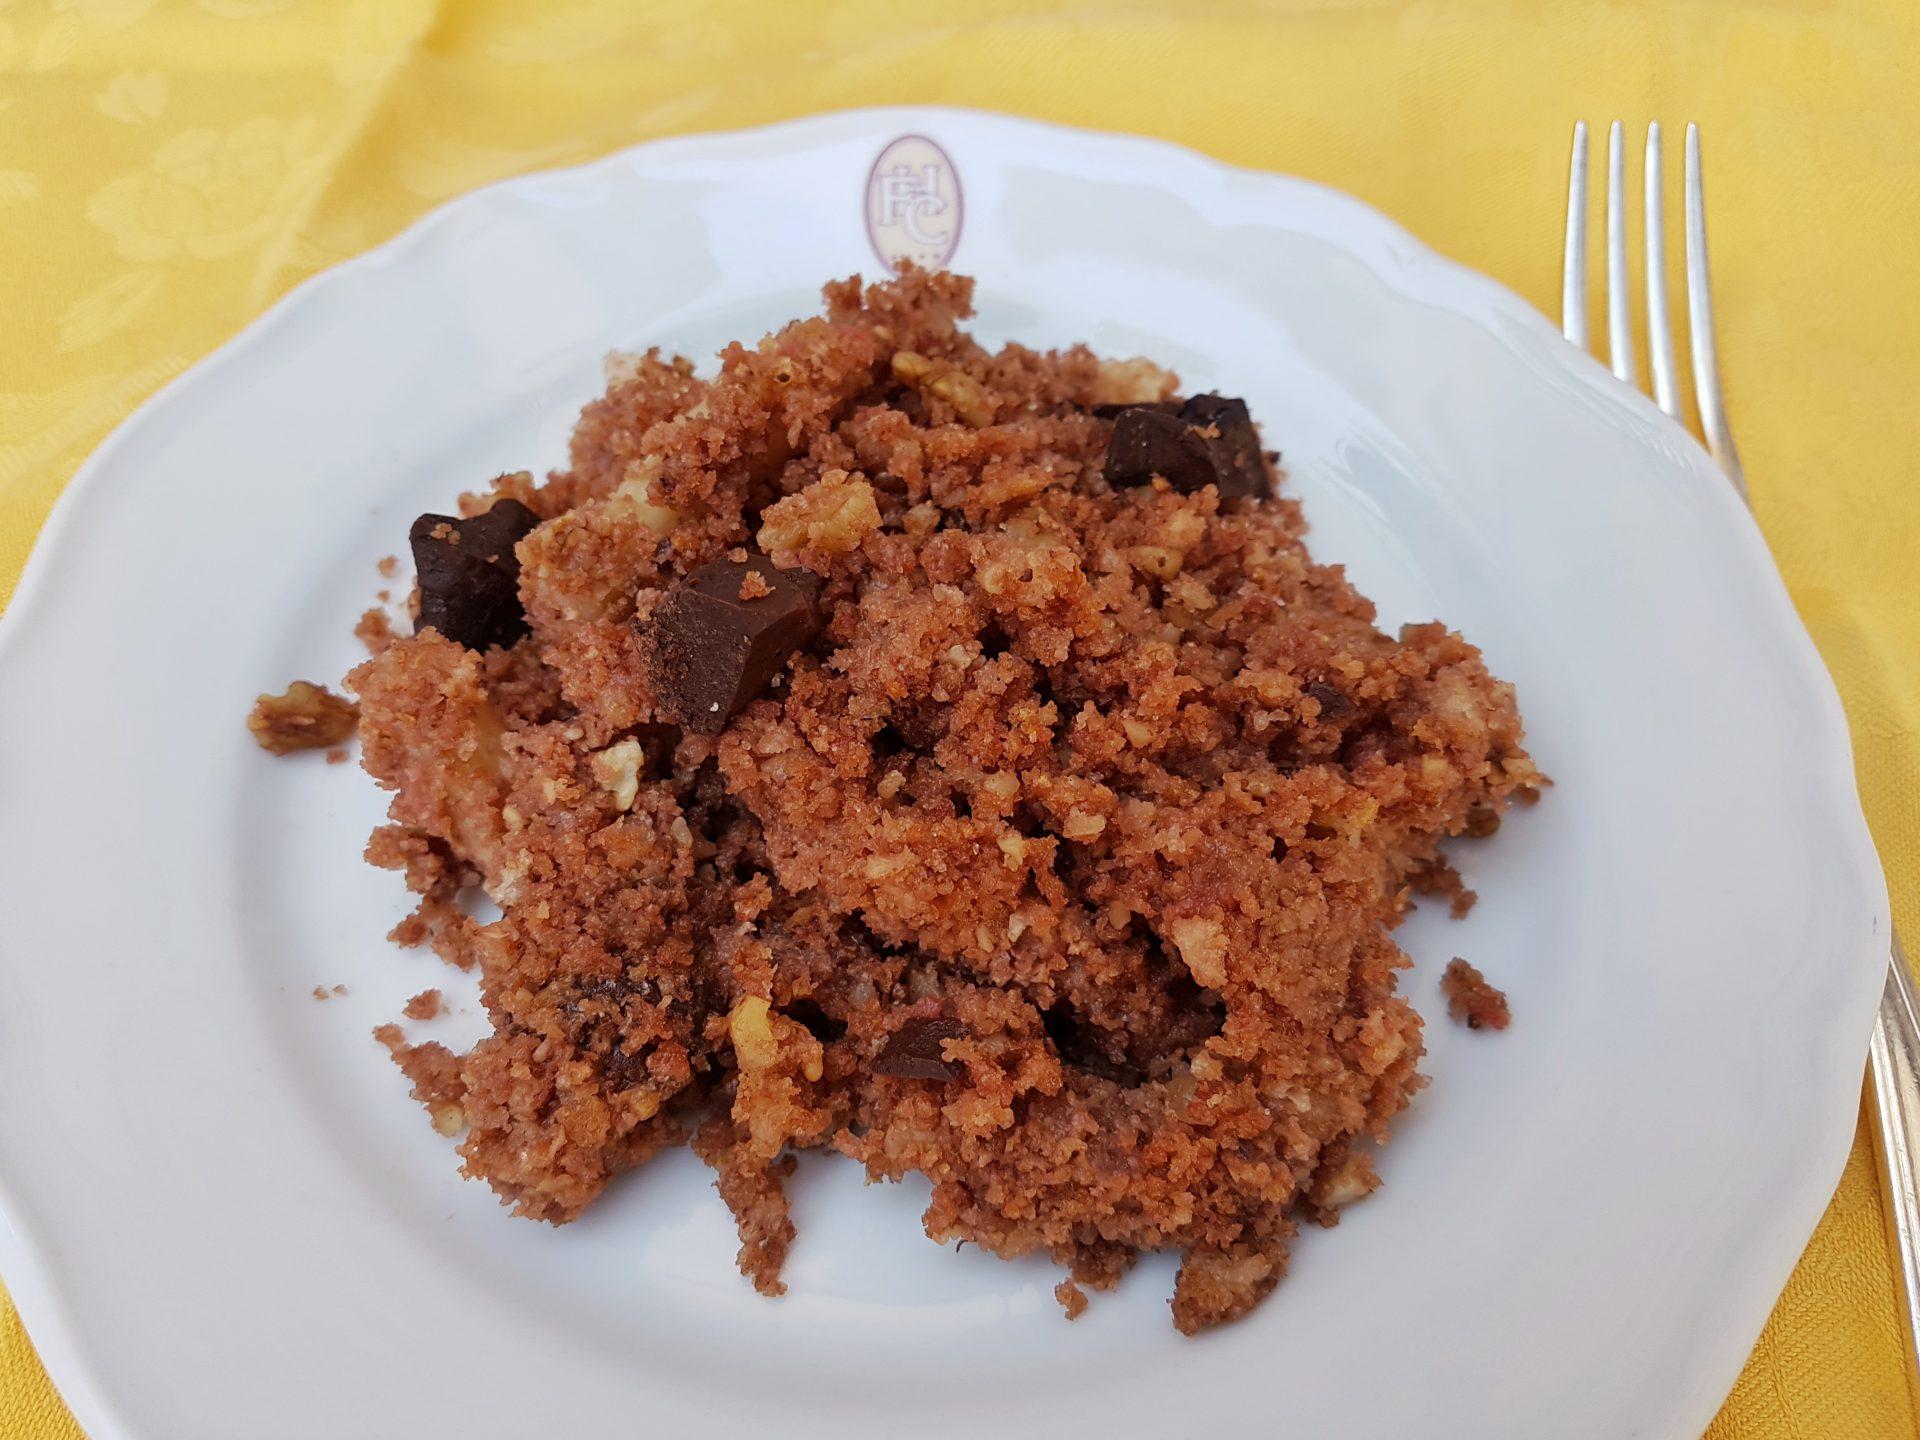 Hotel Fonte Cesia - maccheroni -pasta - sweet pasta- recipe- ricetta - Maccheroni dolci-